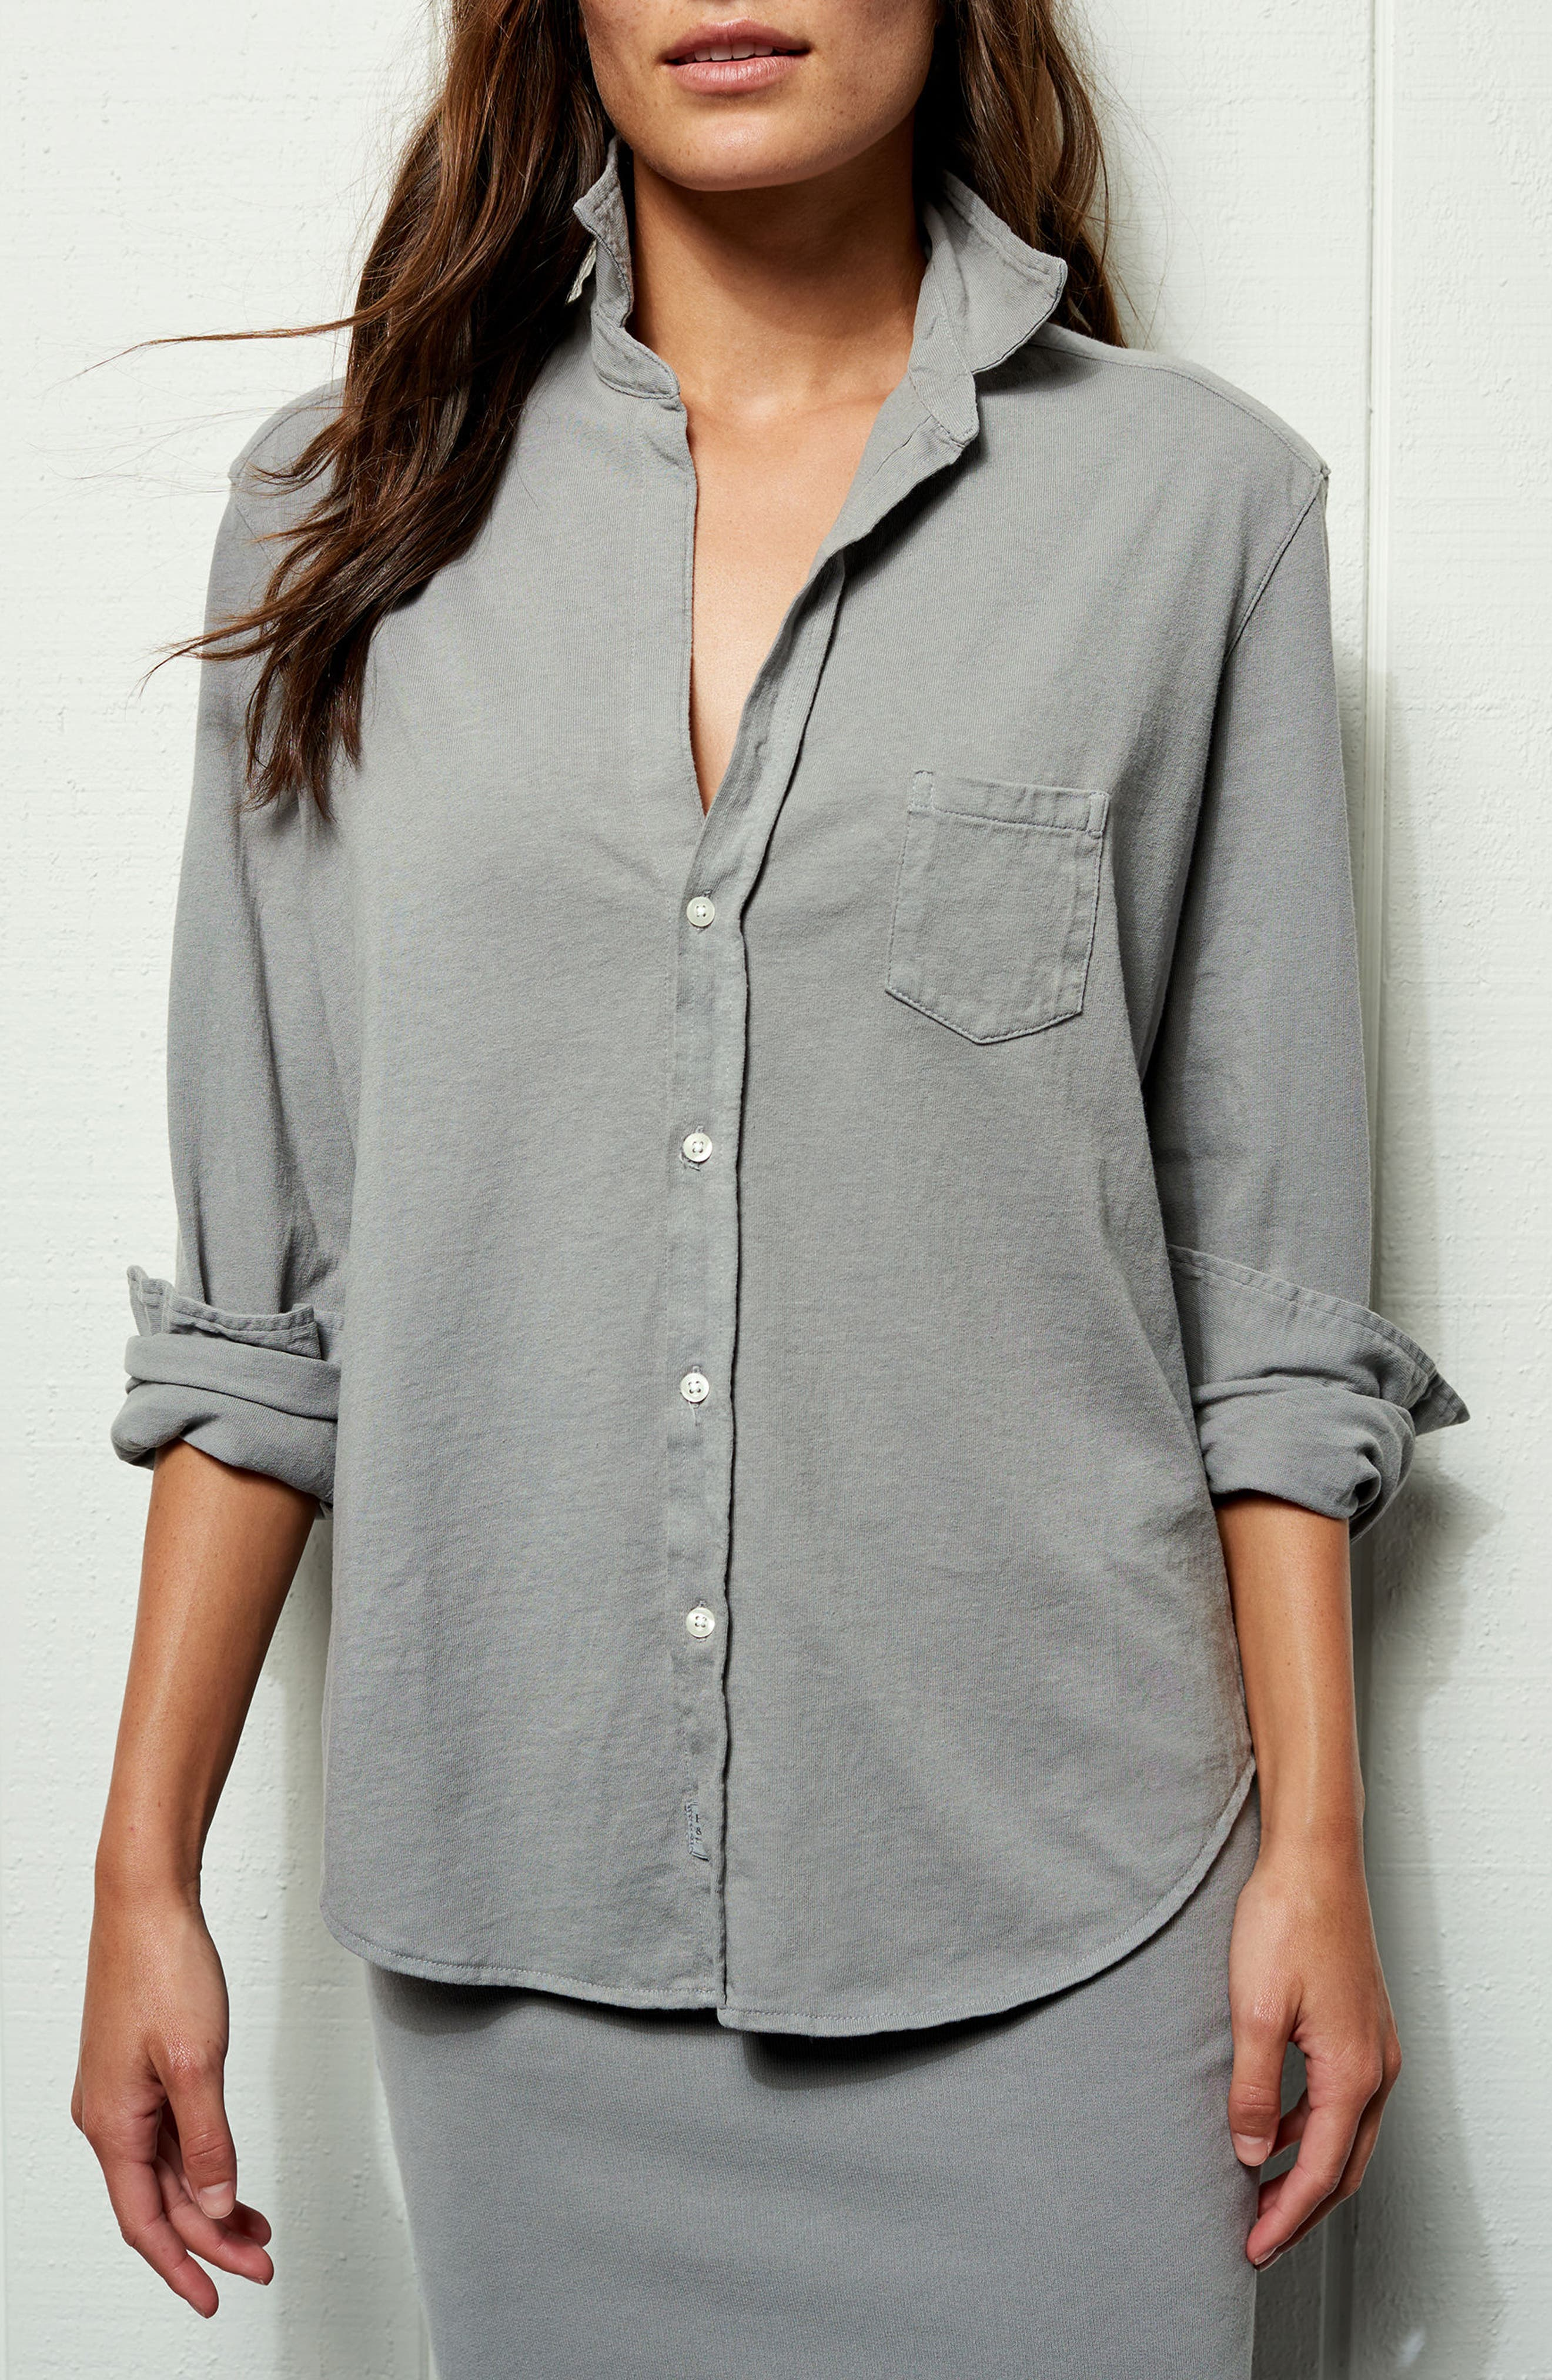 Tee Lab Knit Button Down Shirt,                             Alternate thumbnail 8, color,                             037